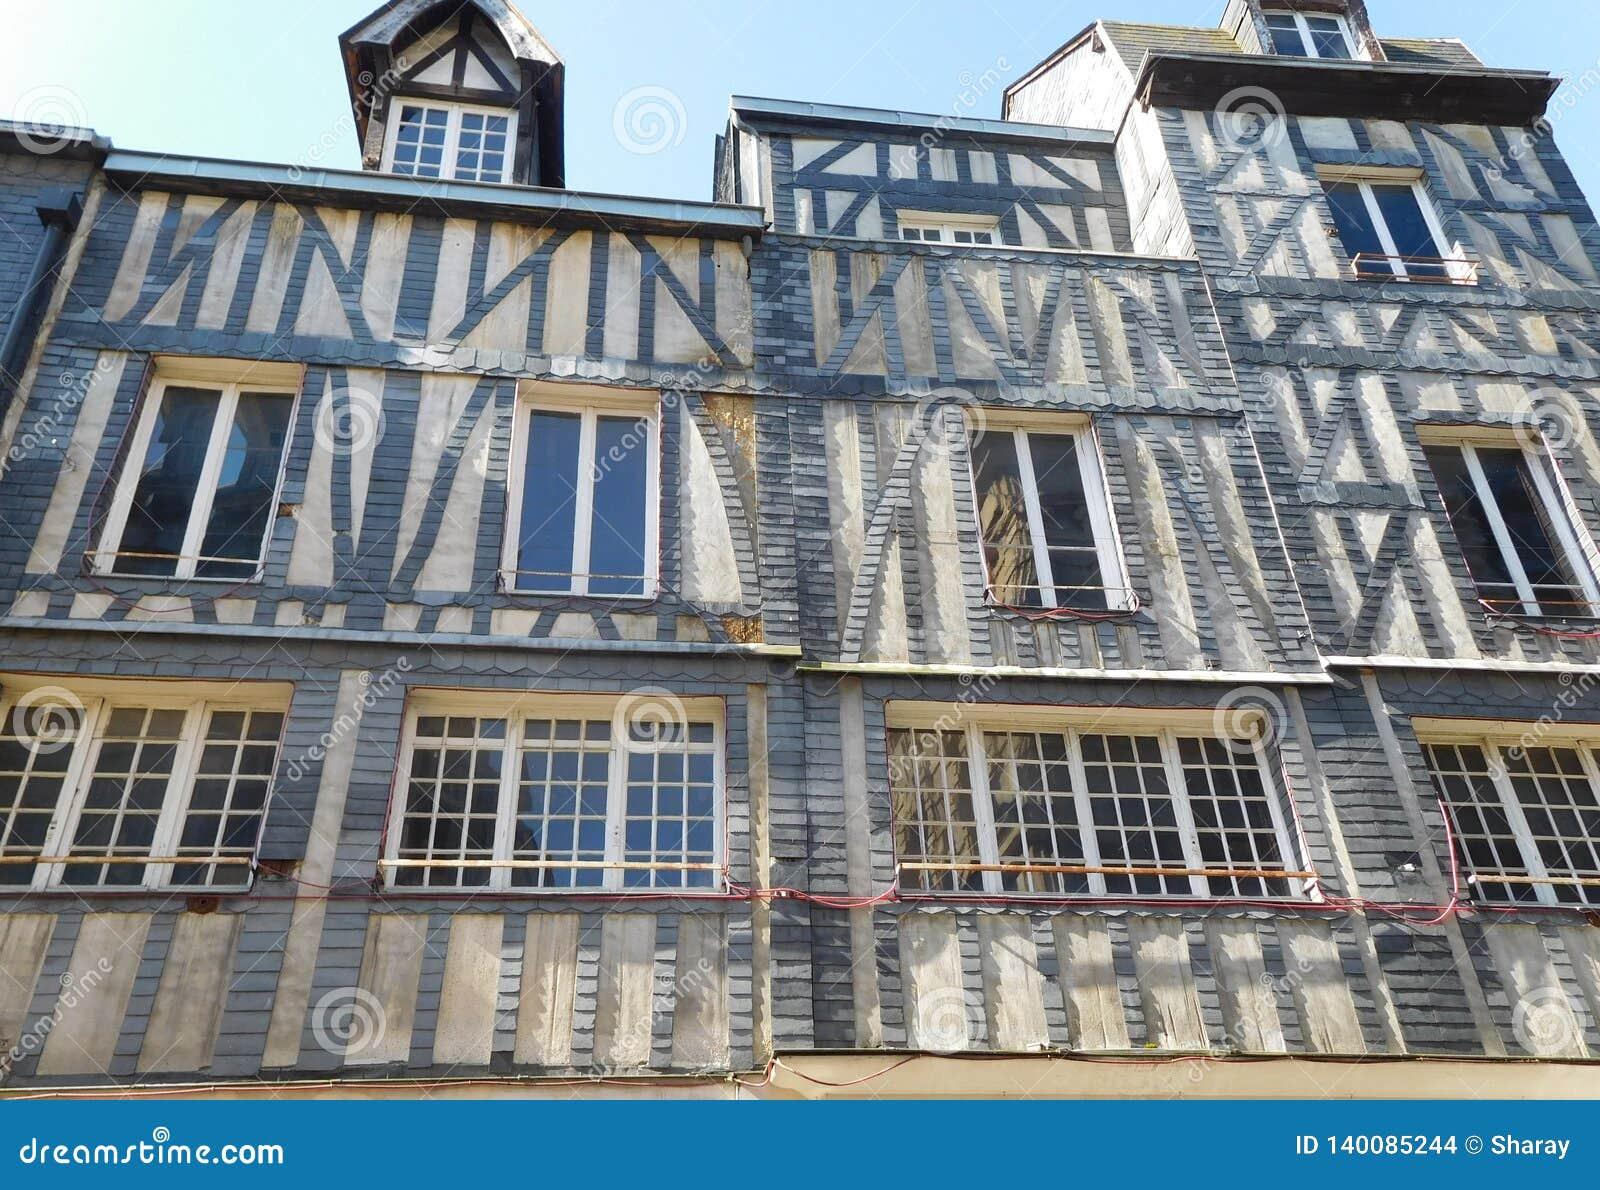 Tudor Architectural-stijl van Huis in Rouen Frankrijk